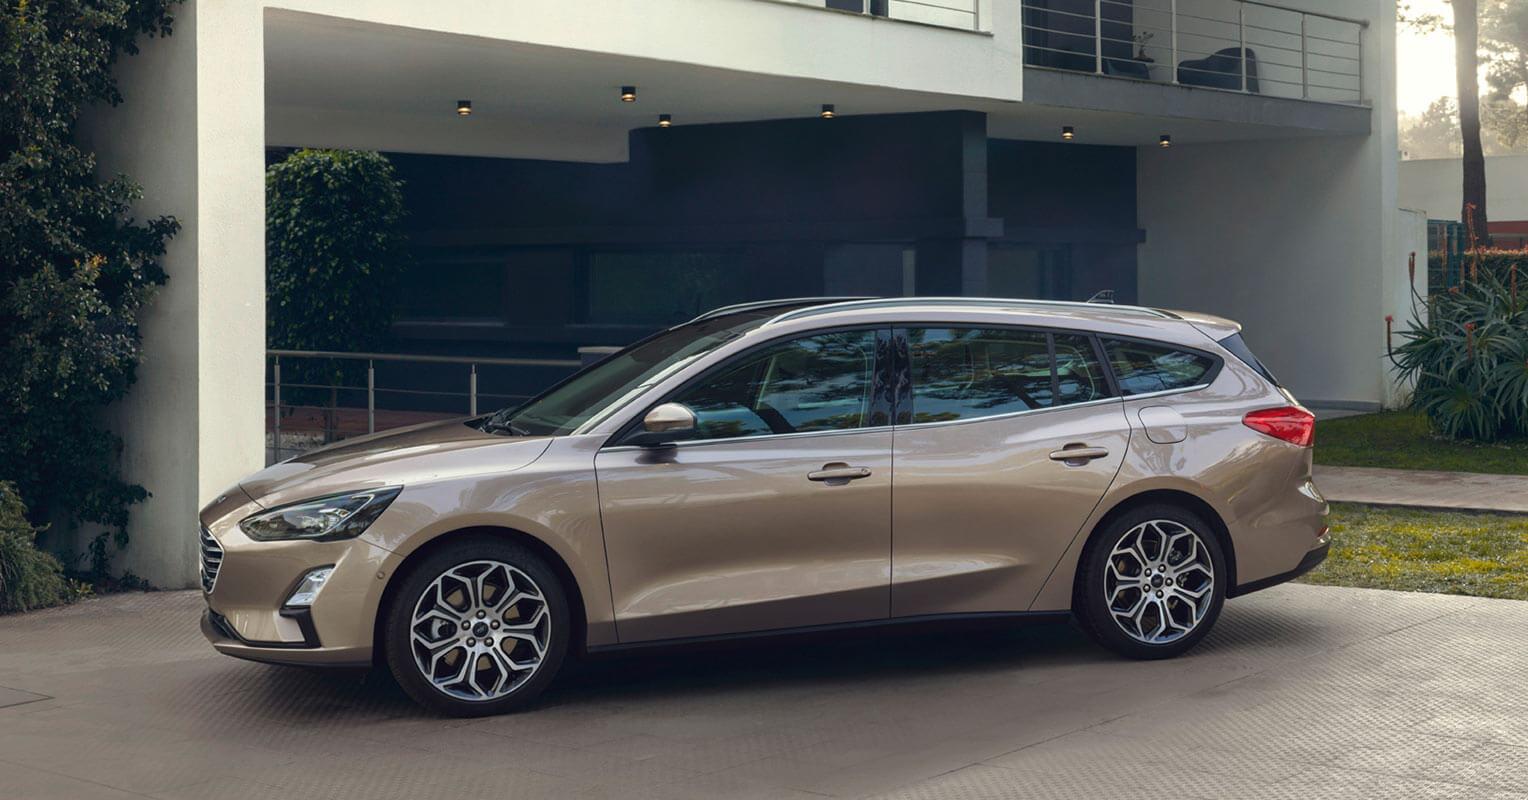 Ford Focus 2019 wagon